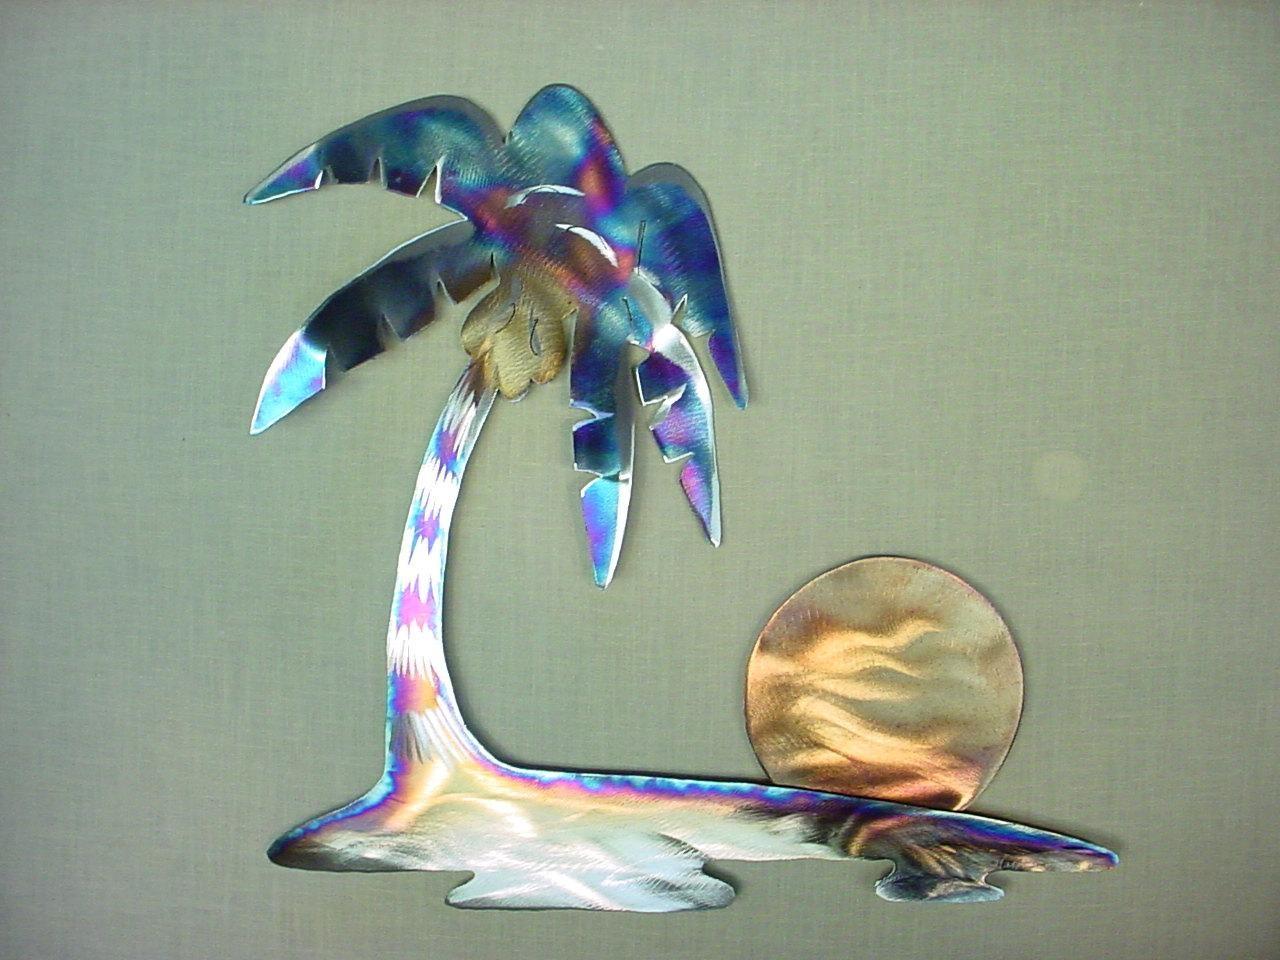 Hawaiian Pacific Tropical Island Hawaii Palm Tree Steel Metal Intended For Palm Tree Metal Wall Art (Image 7 of 20)